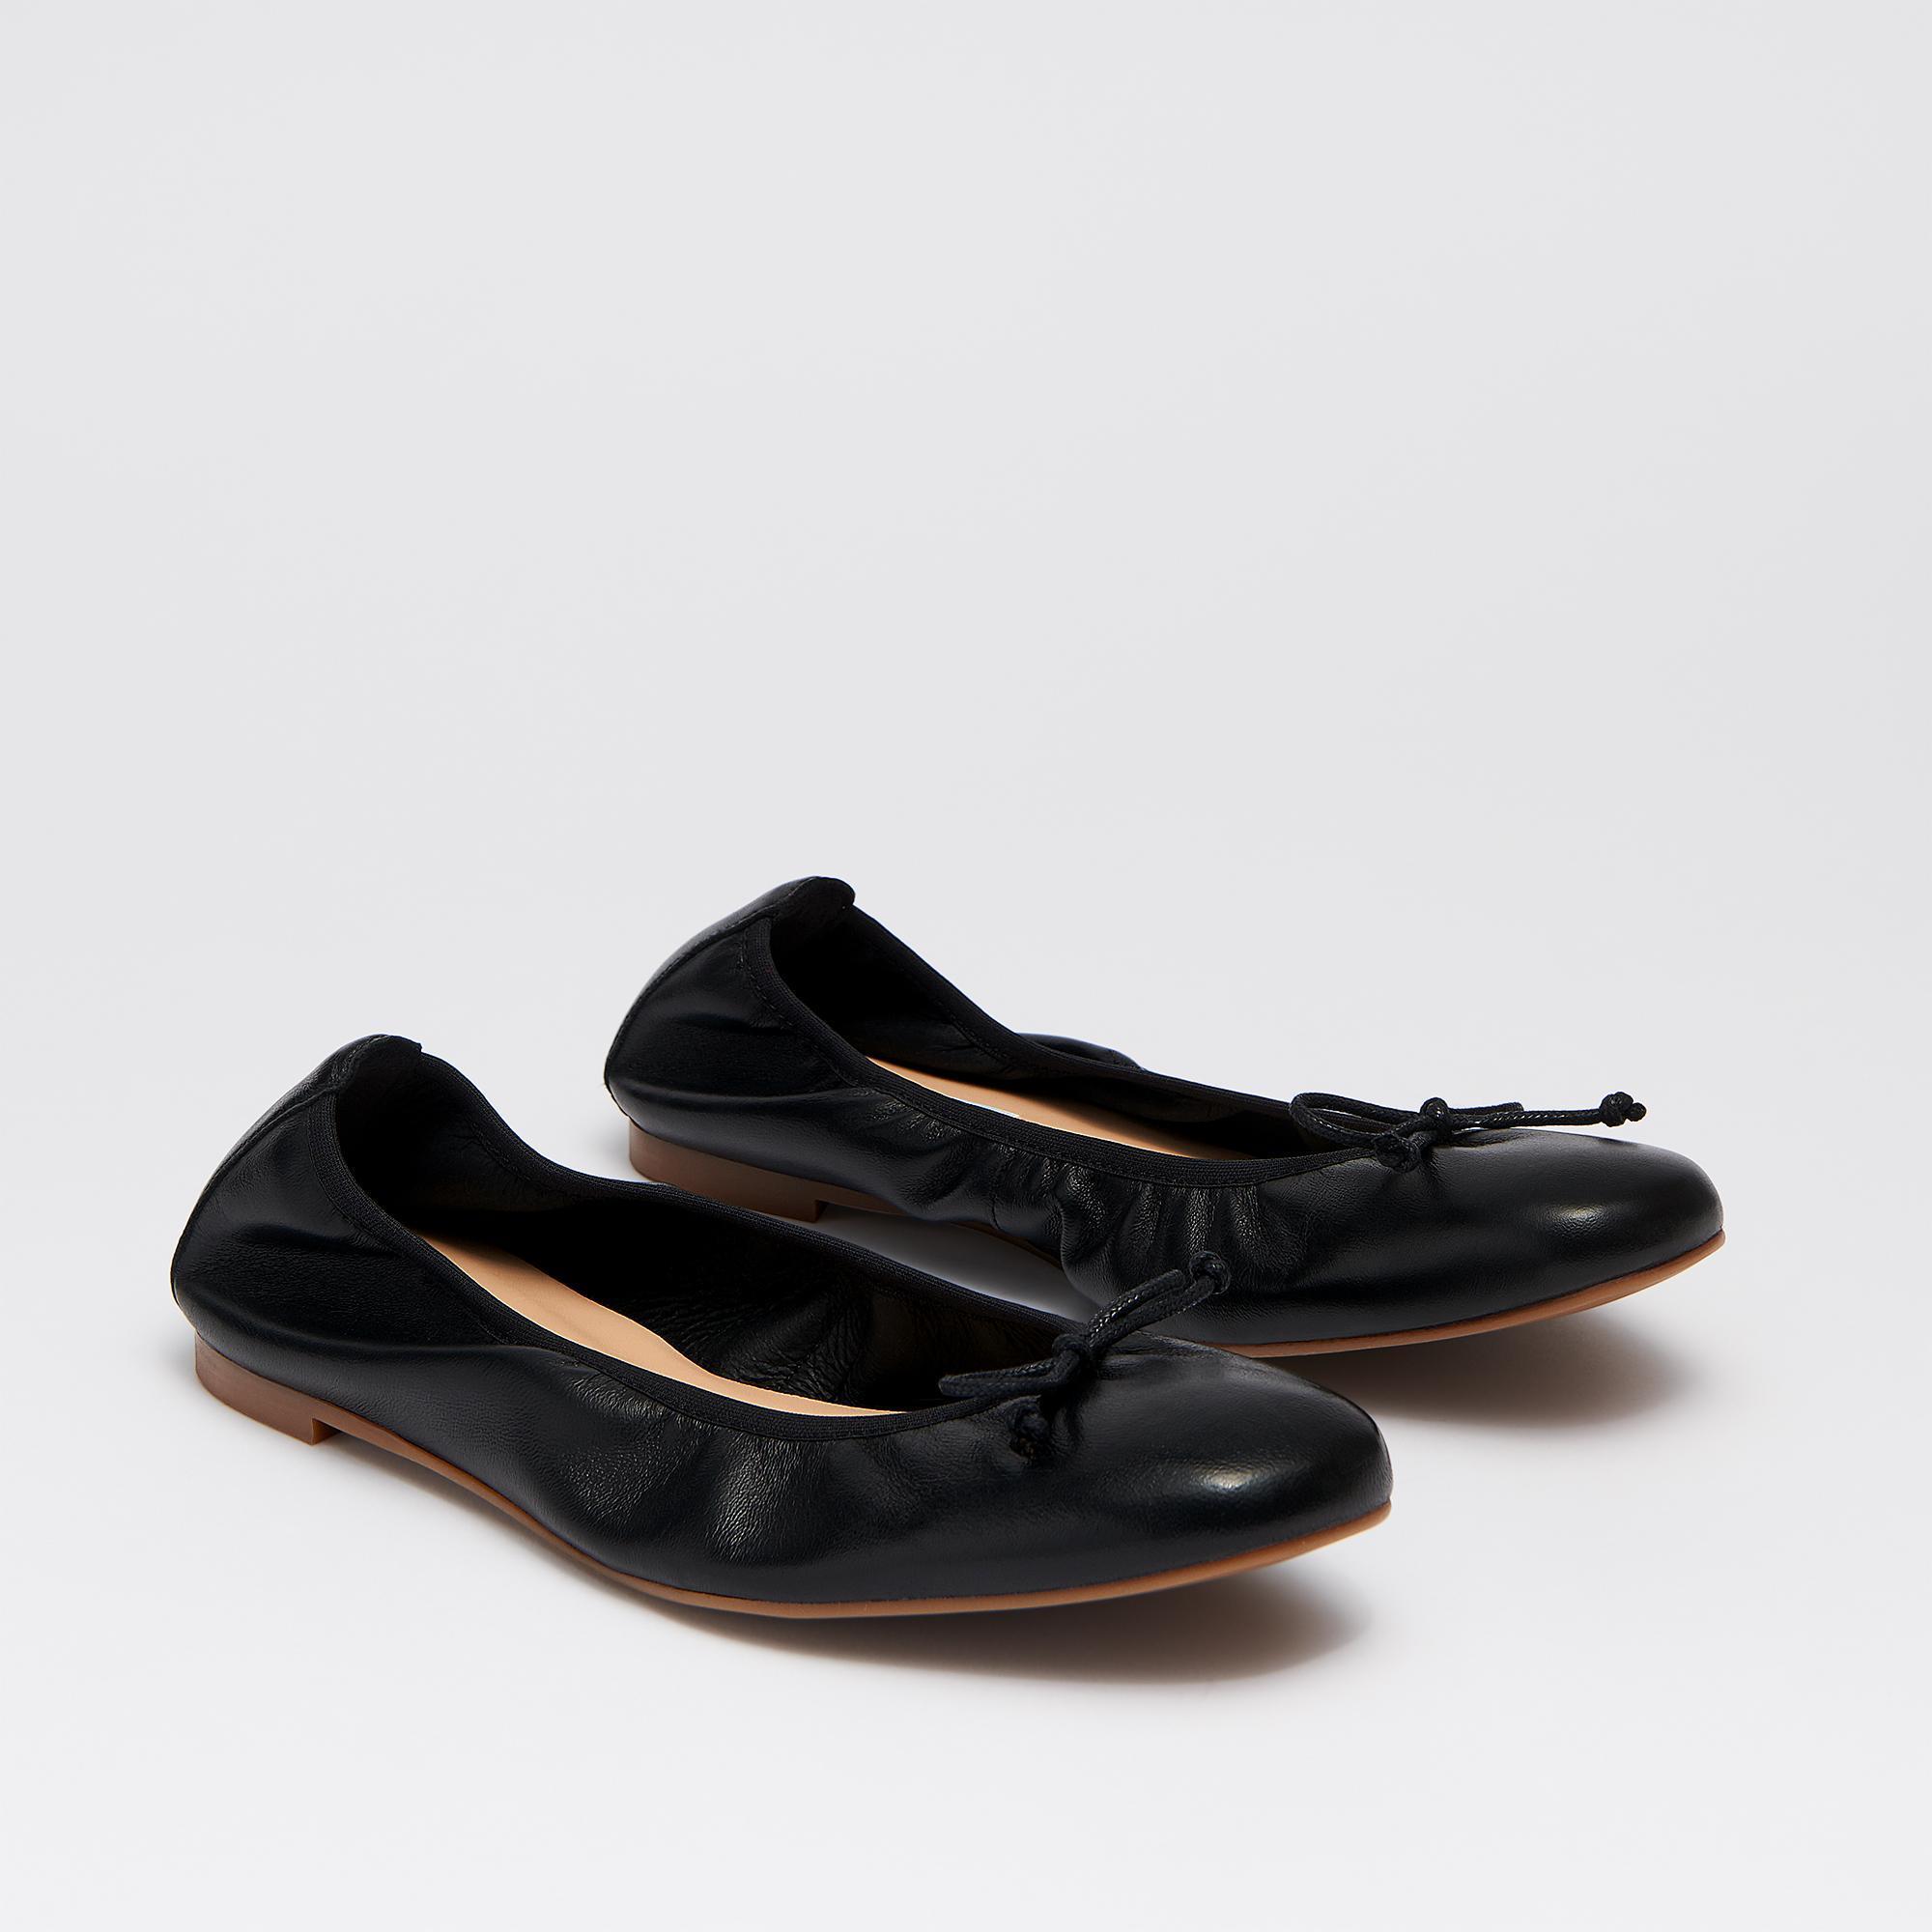 766508de1ed5 L.K.Bennett - Trilly Black Leather Flats - Lyst. View fullscreen